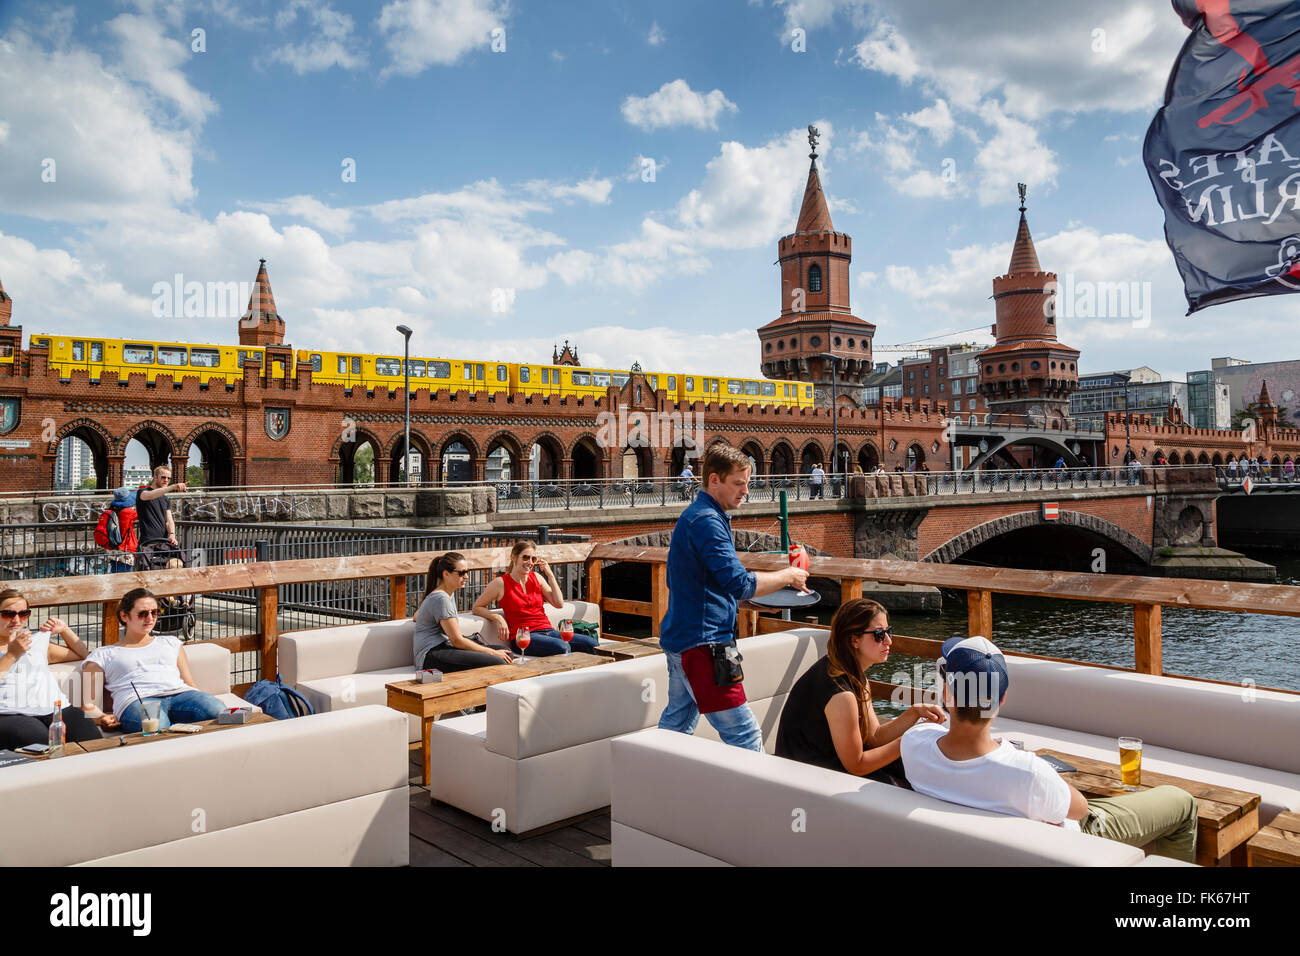 View over Oberbaum bridge (Oberbaumbrucke) Friedrichshain/Kreuzberg, Berlin, Germany, Europe - Stock Image